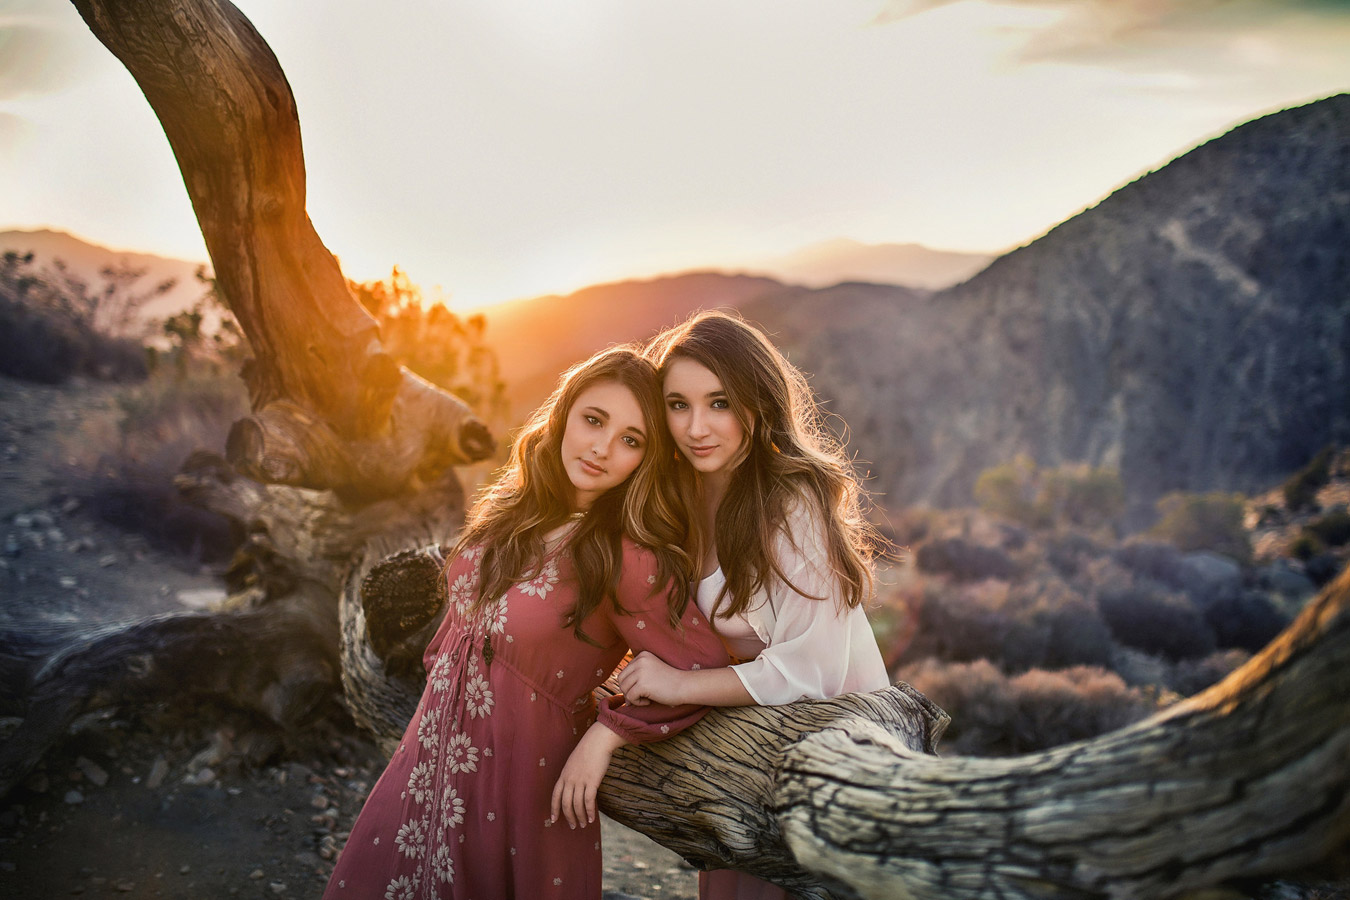 Тара Томлинсон / Tara Tomlinson, США, Финалист в категории «Старшеклассники», Фотоконкурс «Семья» — Rangefinder Family